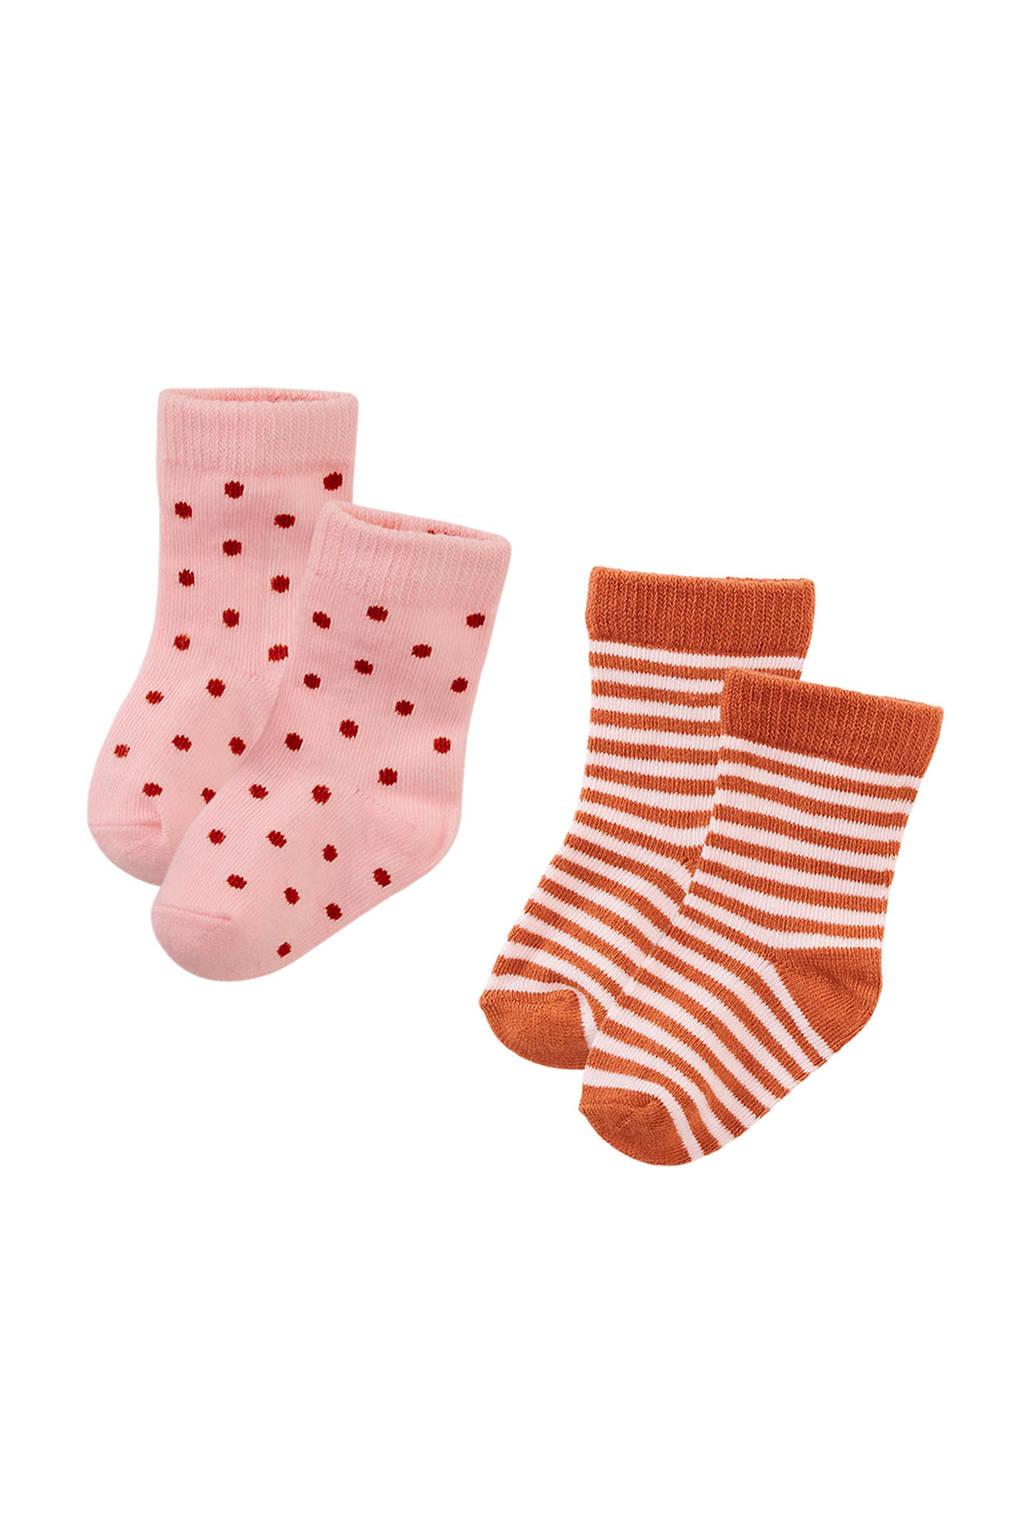 Z8 sokken Tucson - set van 2 roze, Lichtroze/roestbruin